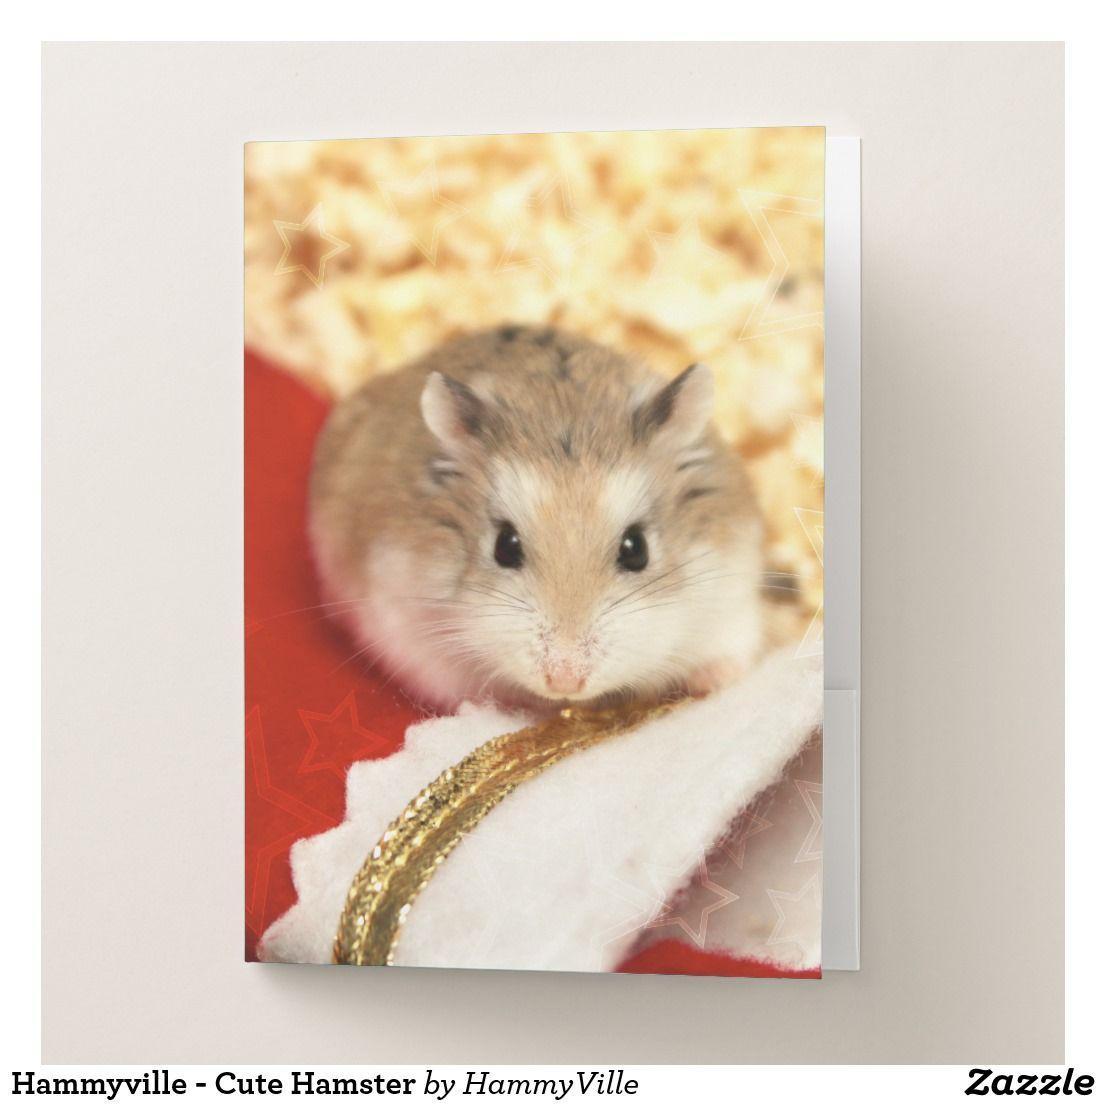 Hammyville Cute Hamster Pocket Folder Zazzle Com Cute Hamsters Cute Fun